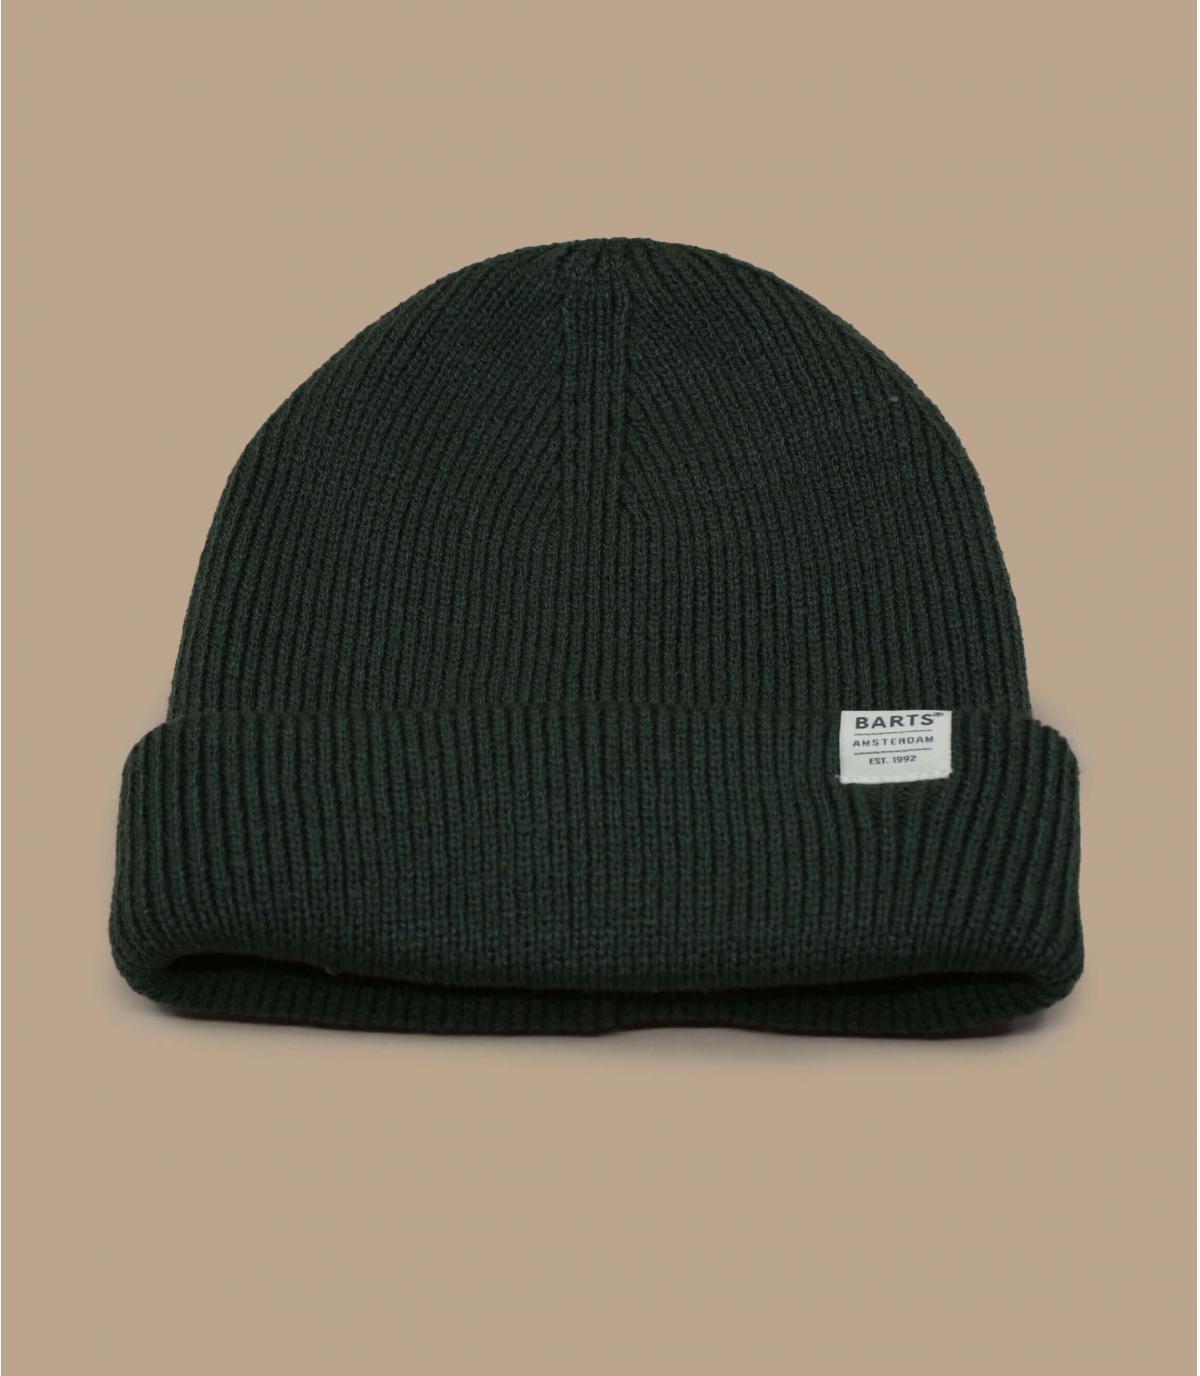 Barts cappello verde docker